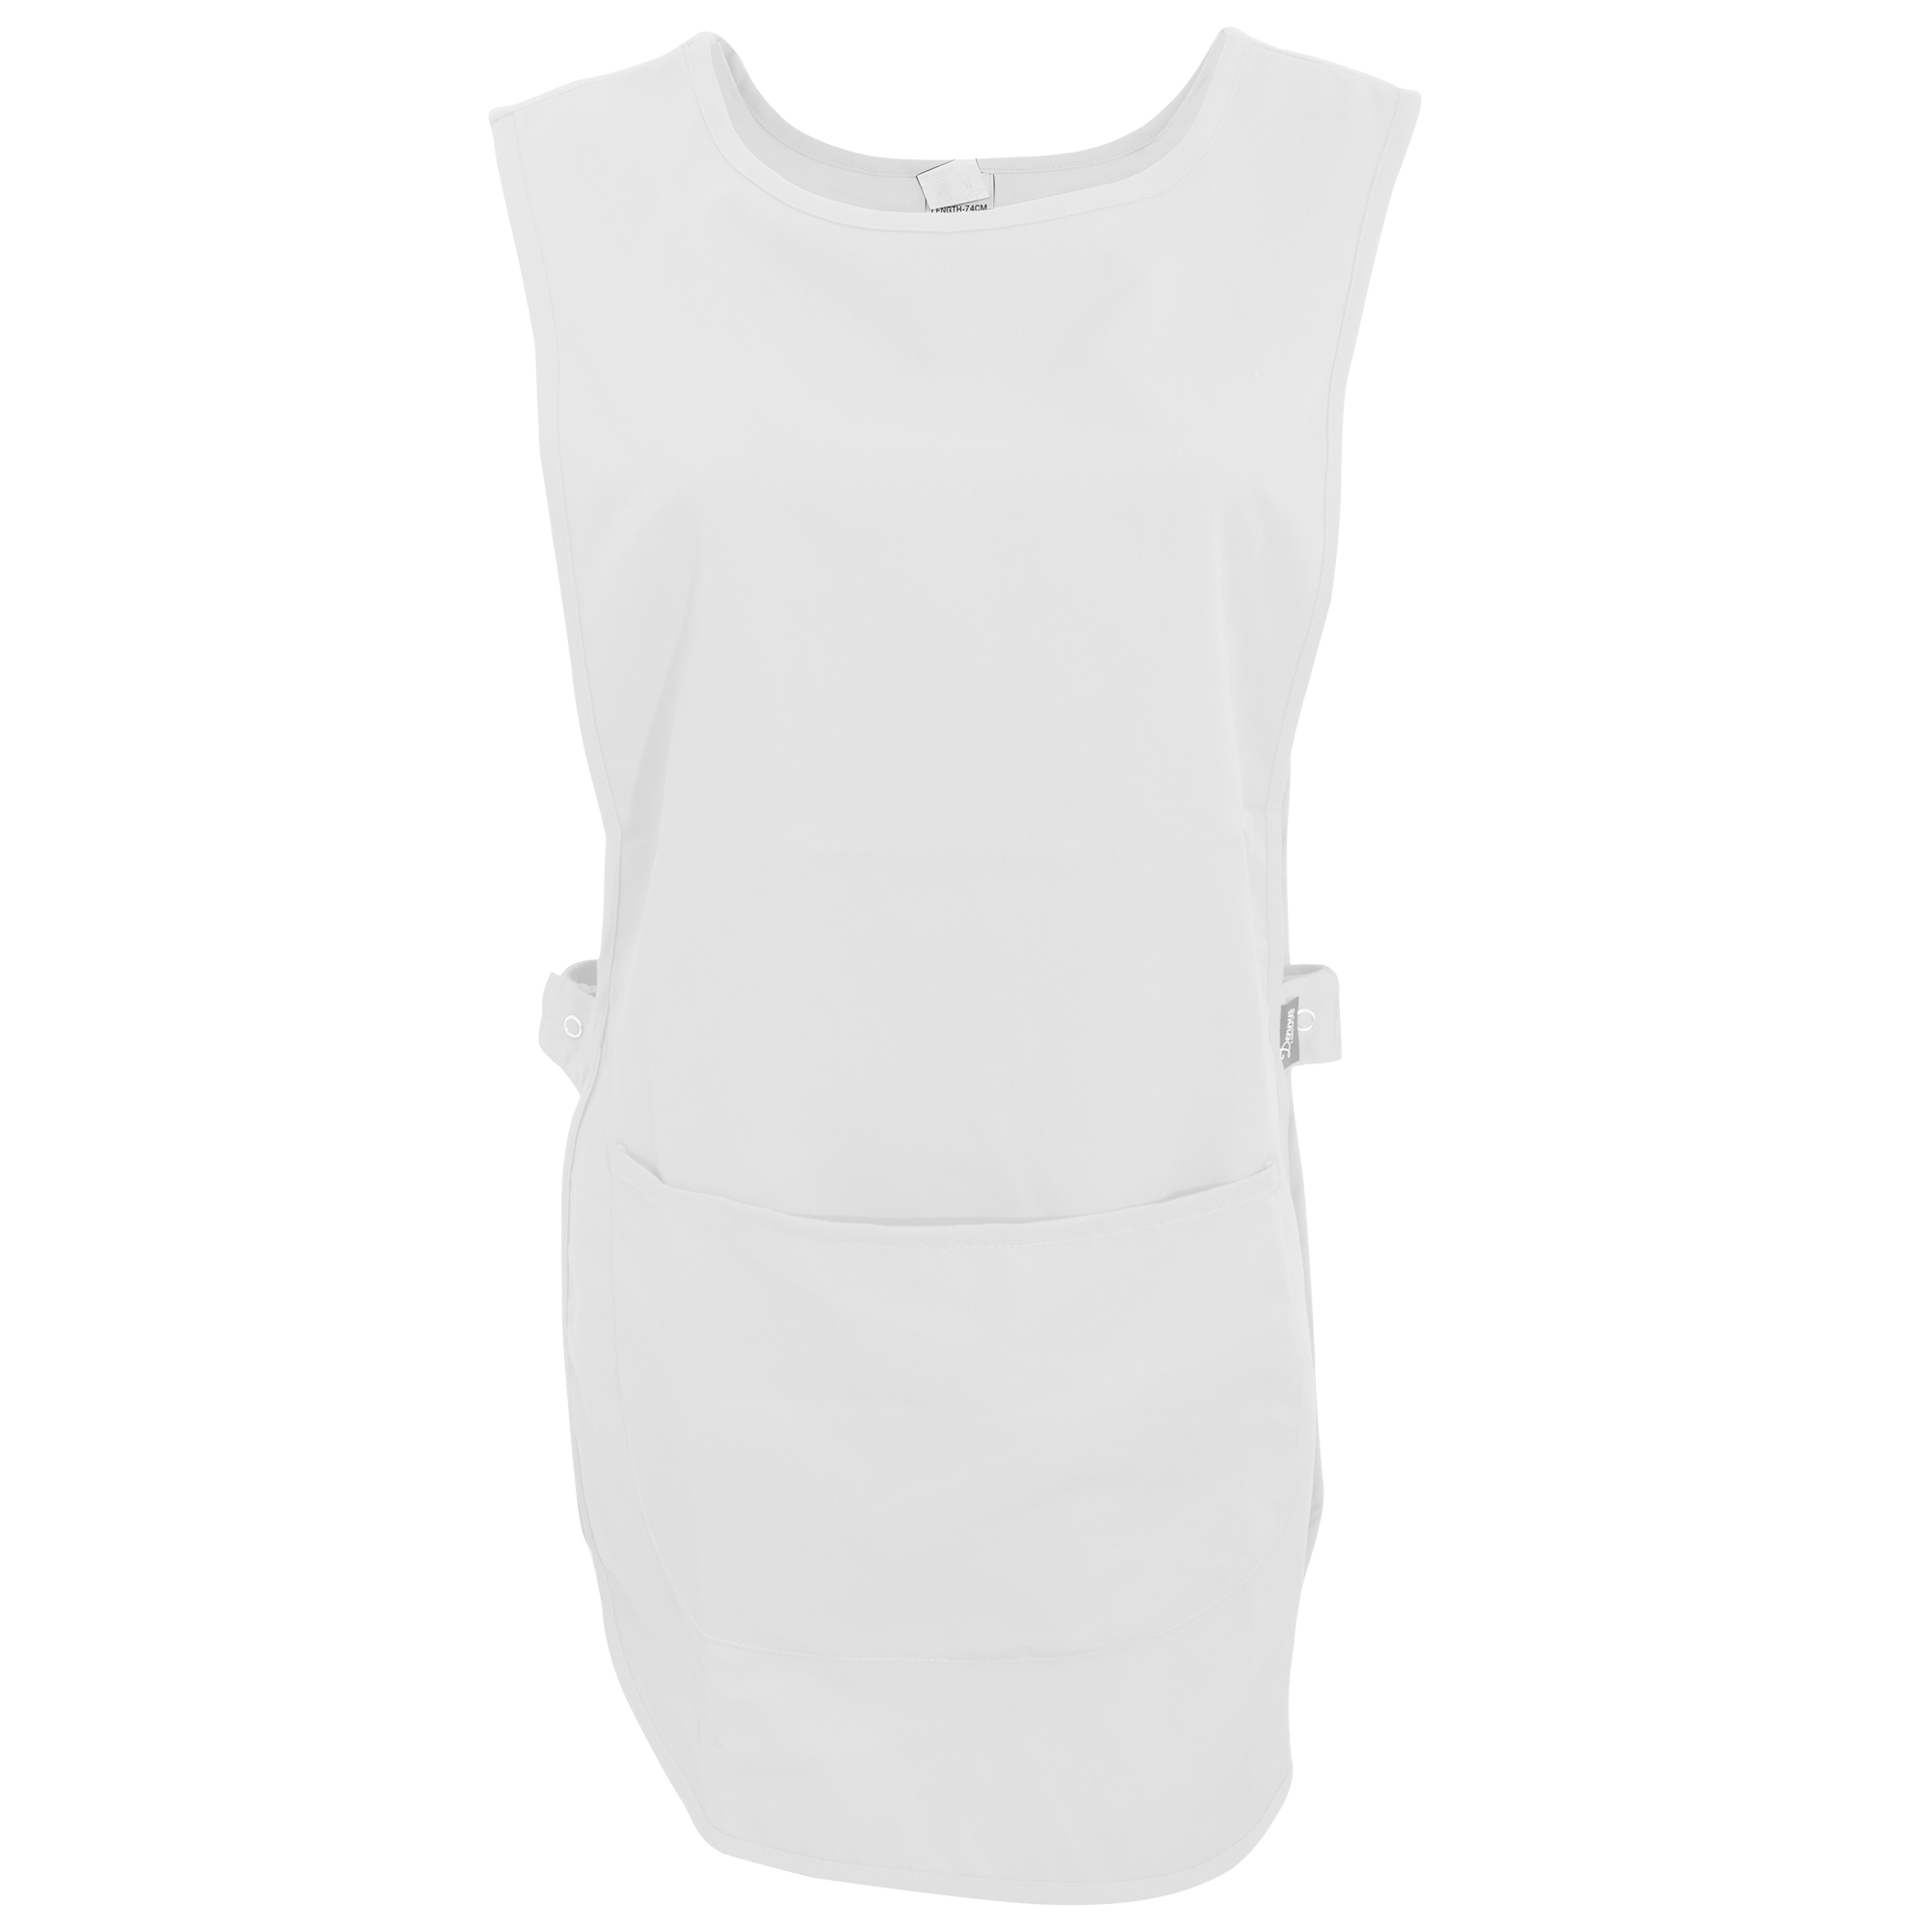 White tabard apron - Dennys Womens Ladies Tabard Apron With Pocket